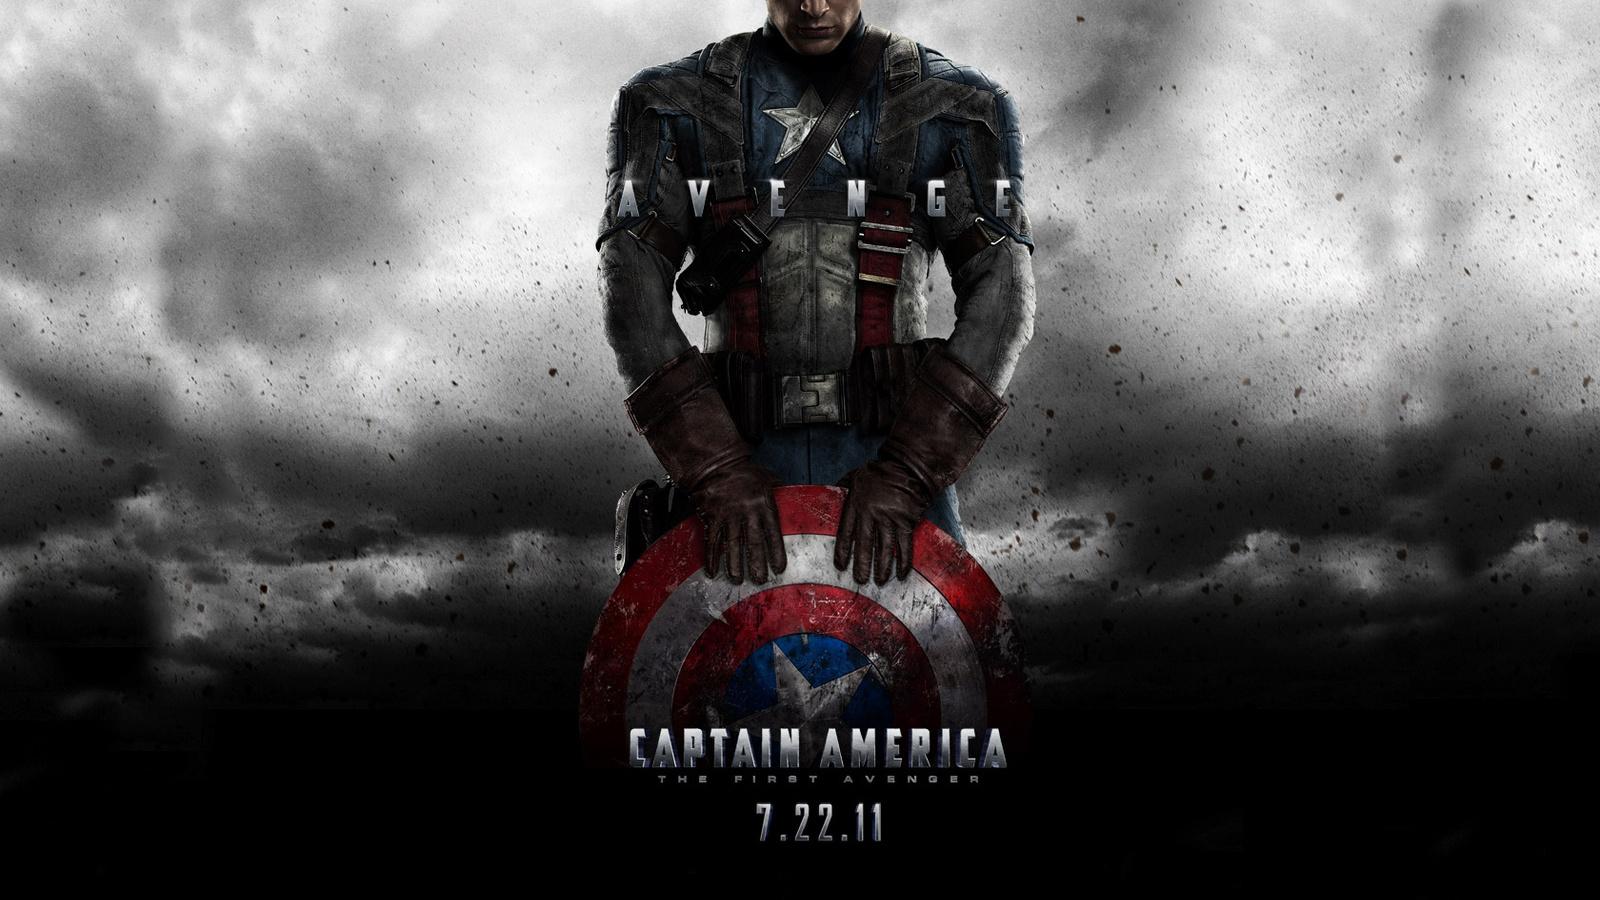 http://3.bp.blogspot.com/-gNSU_jQ26zg/TZbwk8vLI1I/AAAAAAAADC8/vLkVxcnobcE/s1600/captain+america+2011+movie+wallpaper.jpg